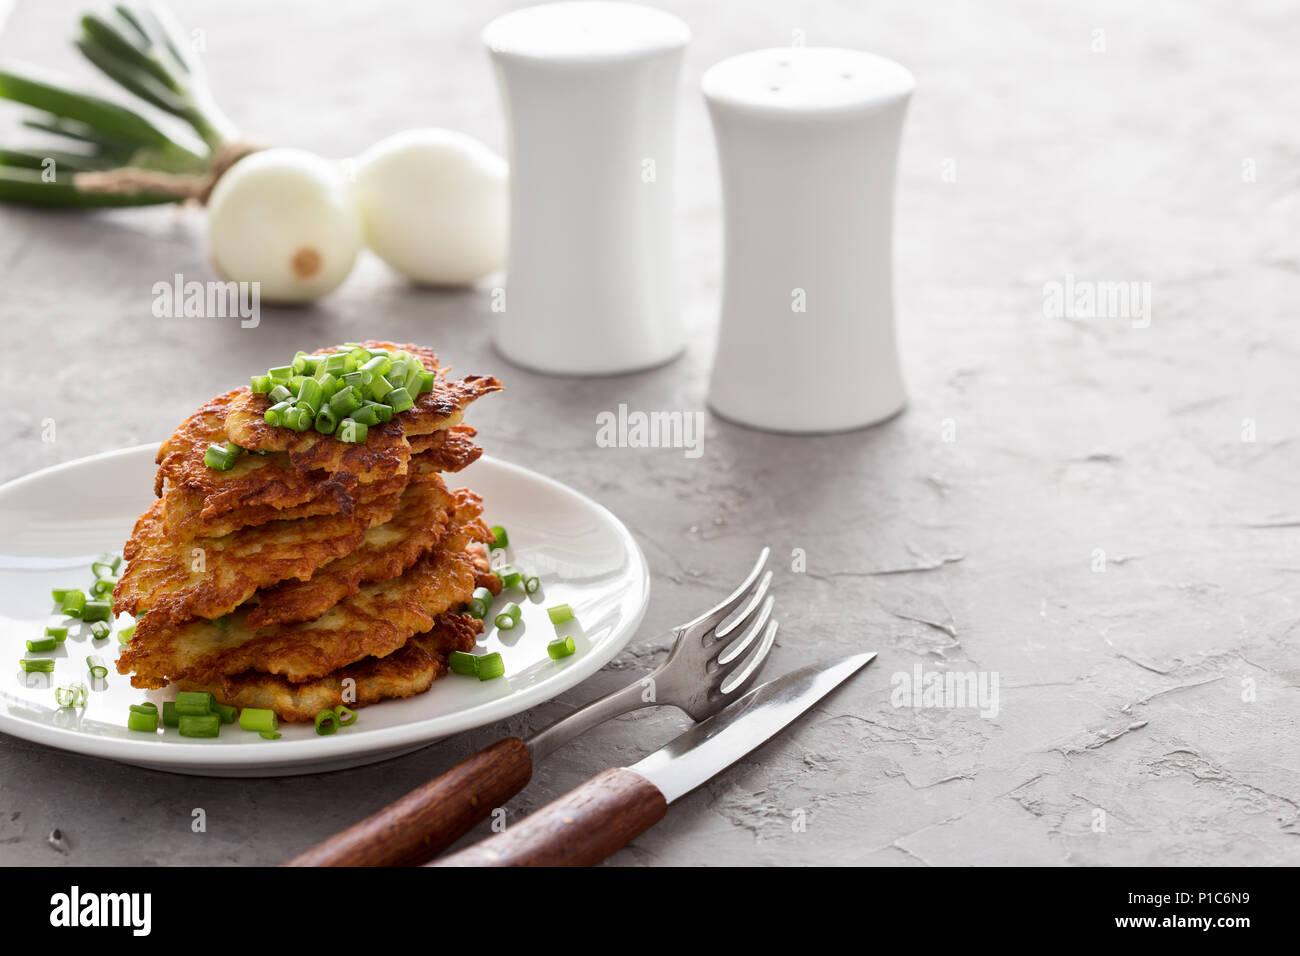 Classic Ukrainian dish deruny, potato pancakes on white plate - Stock Image